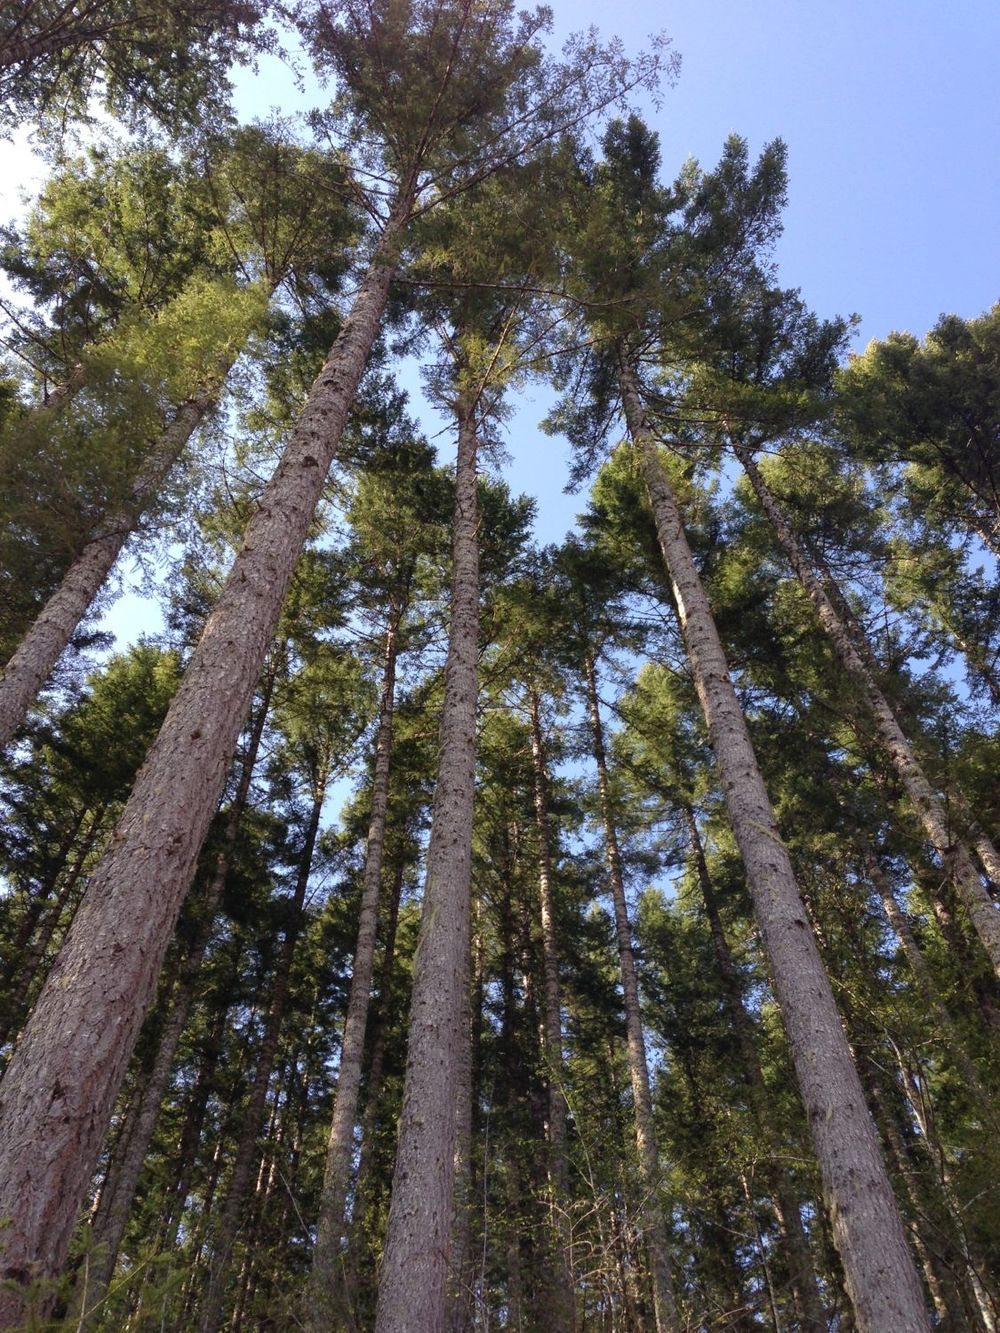 Tall trees :)